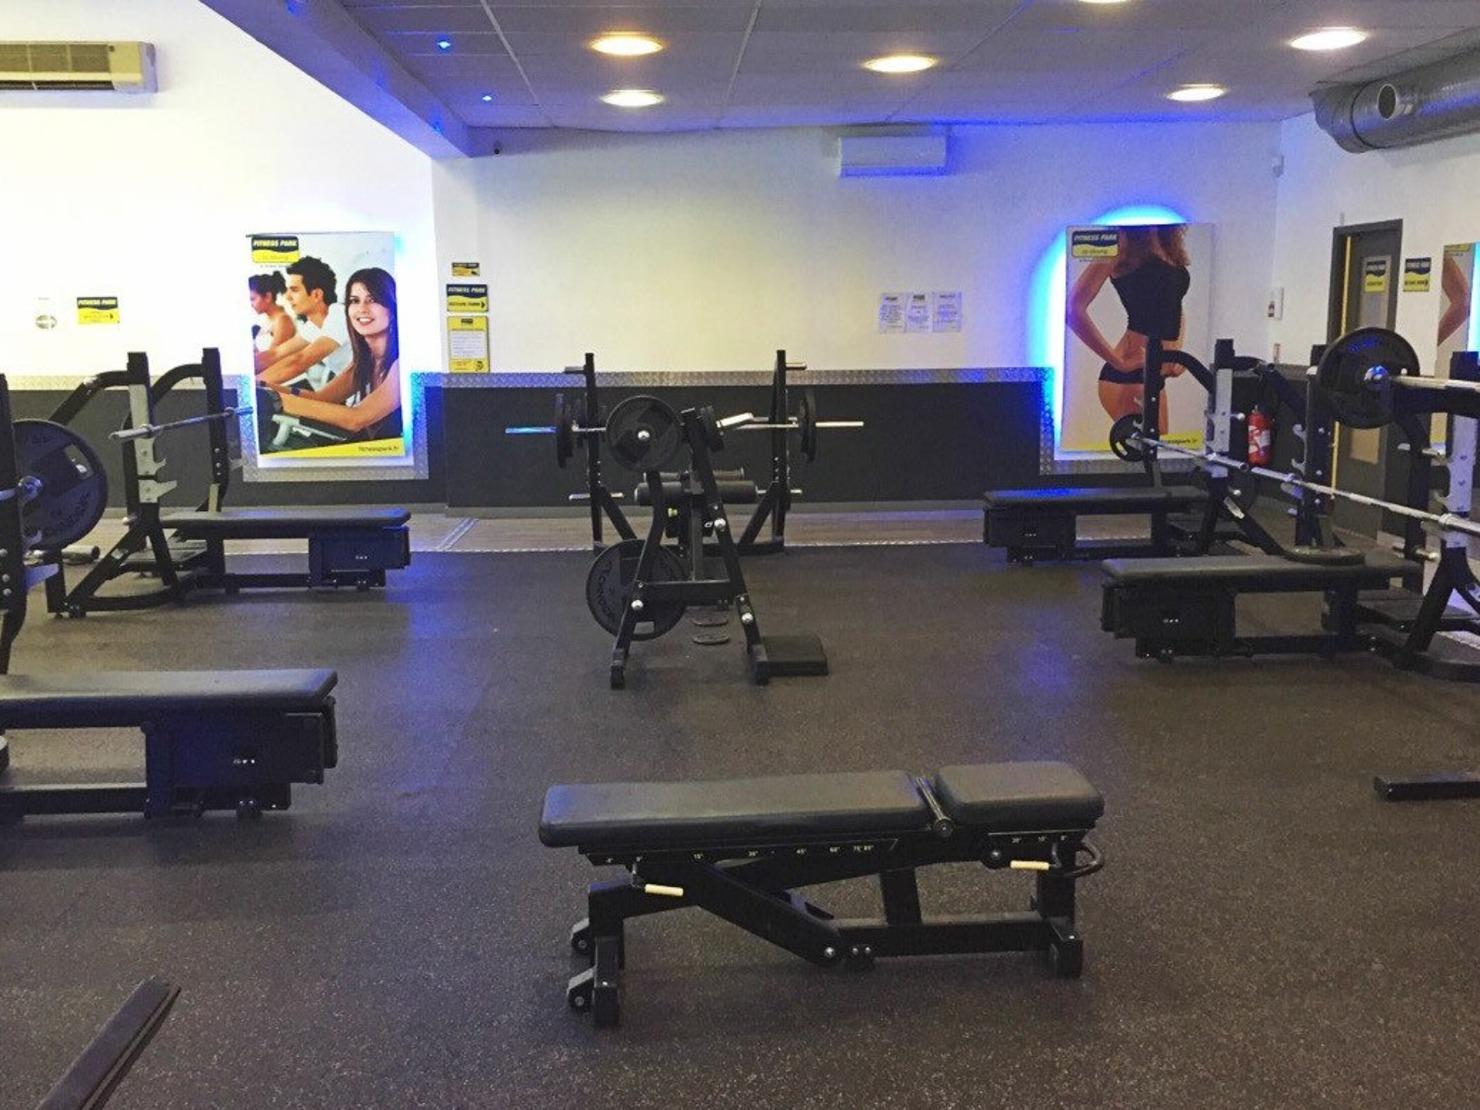 fitness park nimes tarifs avis horaires offre d couverte. Black Bedroom Furniture Sets. Home Design Ideas